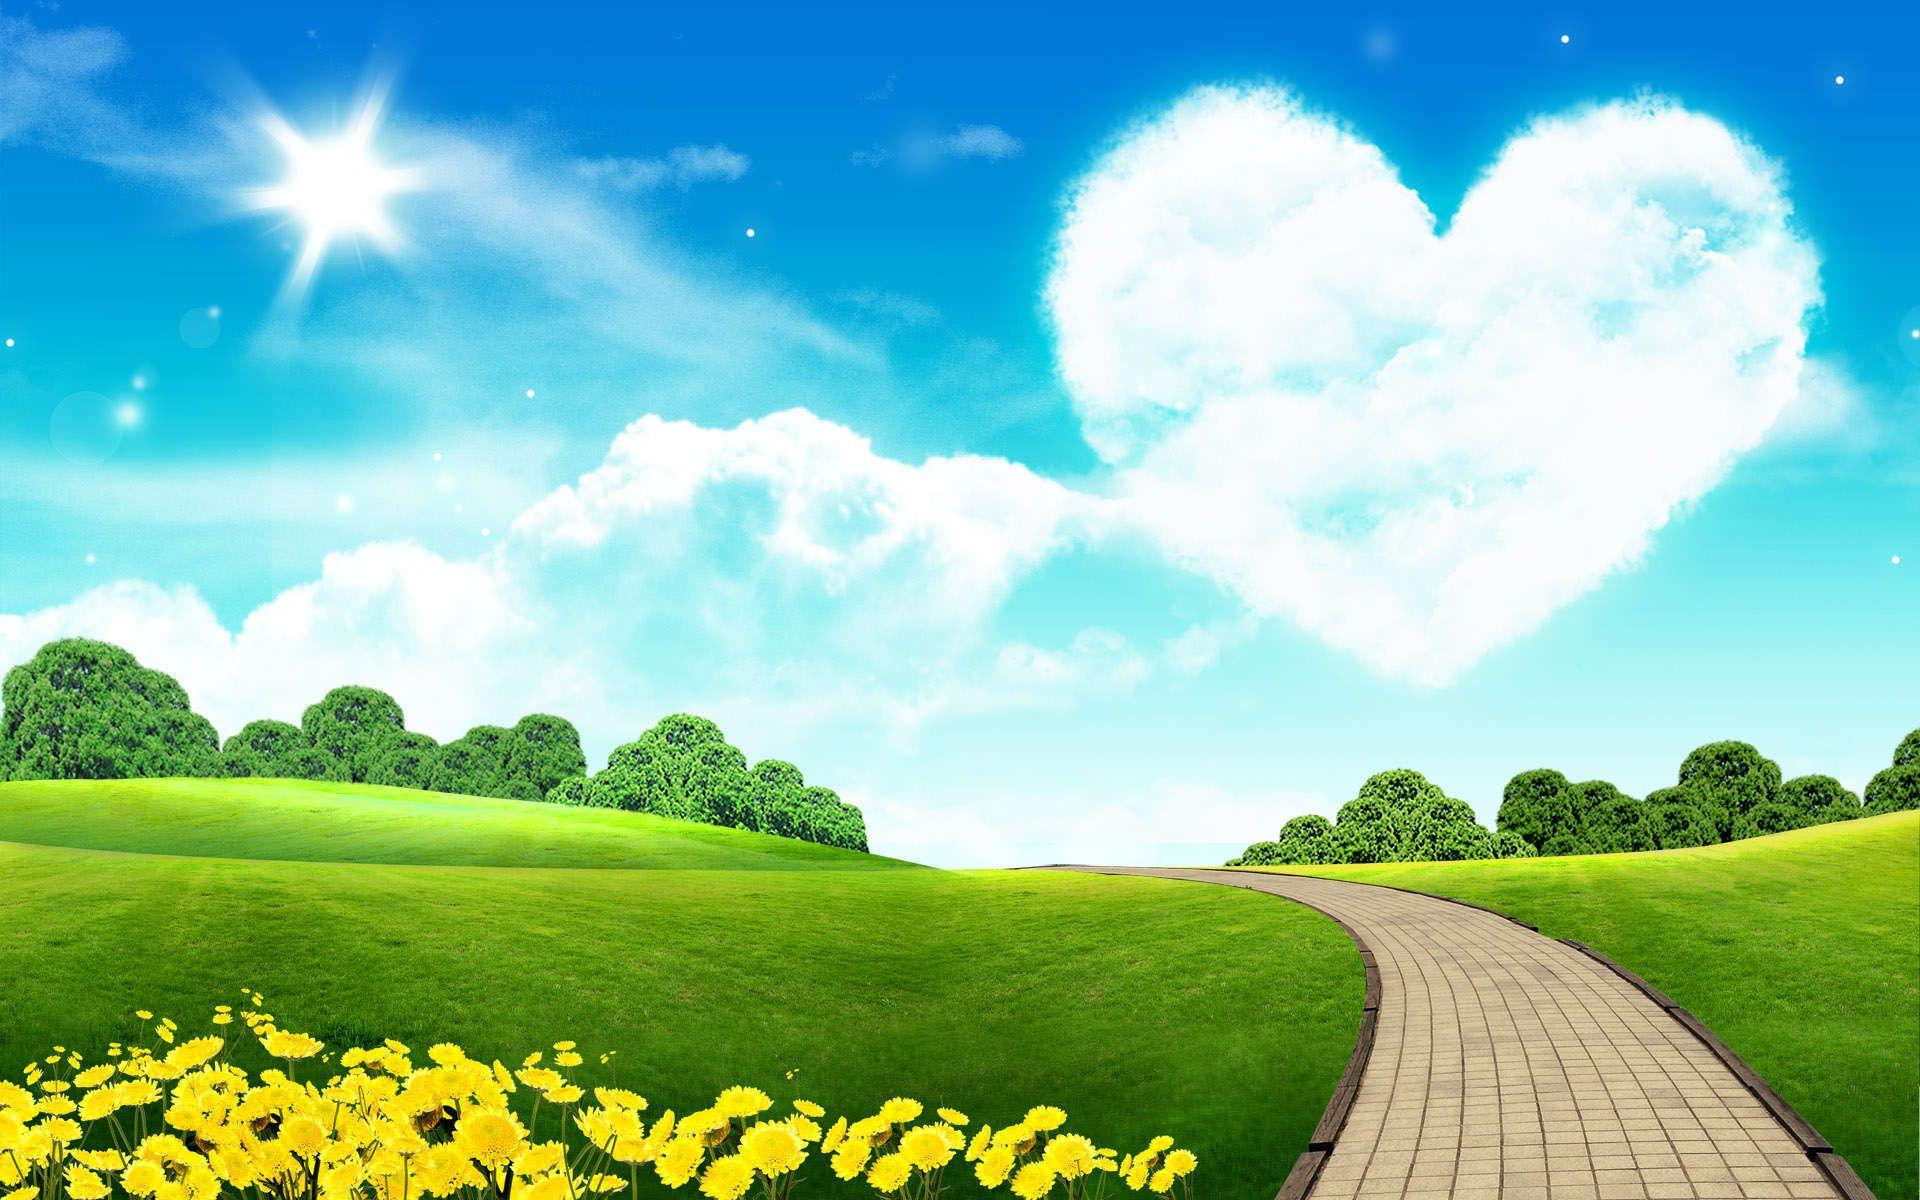 View And Download Love Heart Shape Tree Flowers 4k Ultra Hd Mobile Wallpaper In 2020 Tree Wallpaper Backgrounds Beautiful Landscape Wallpaper Love Wallpapers Romantic